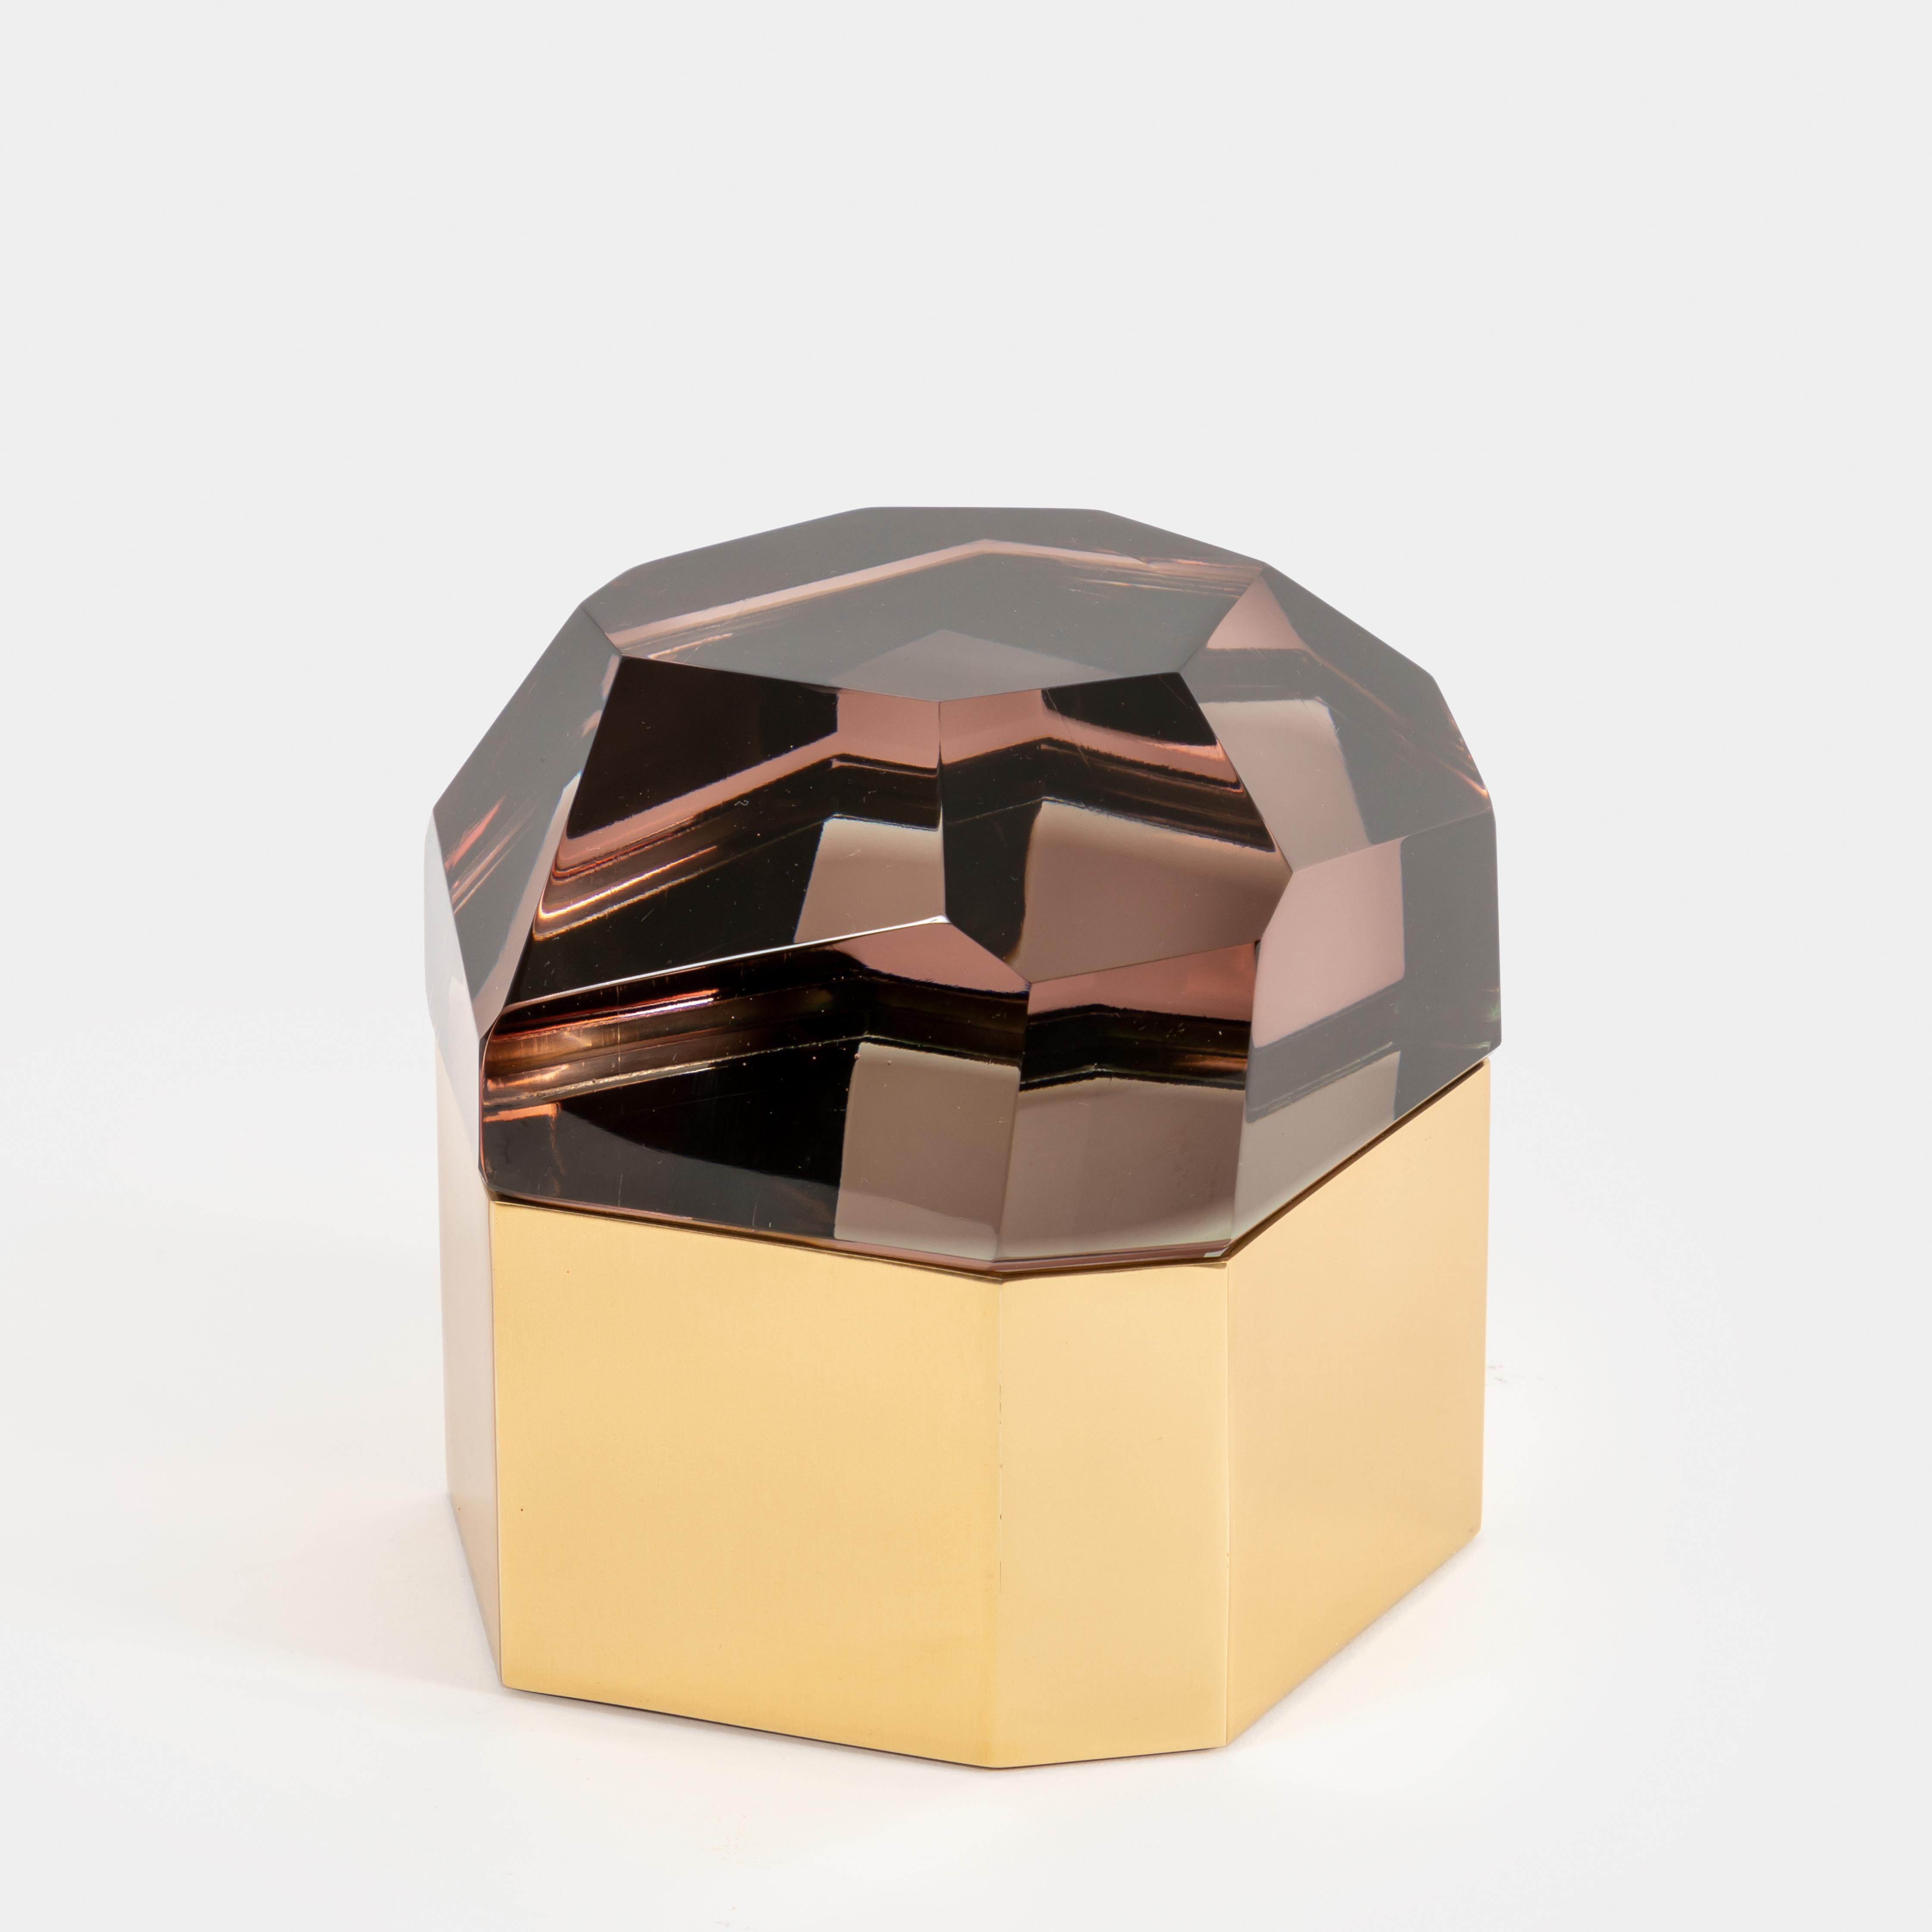 'Diamante Murano' Glass Box by Roberto Giulio Rida   soyun k.